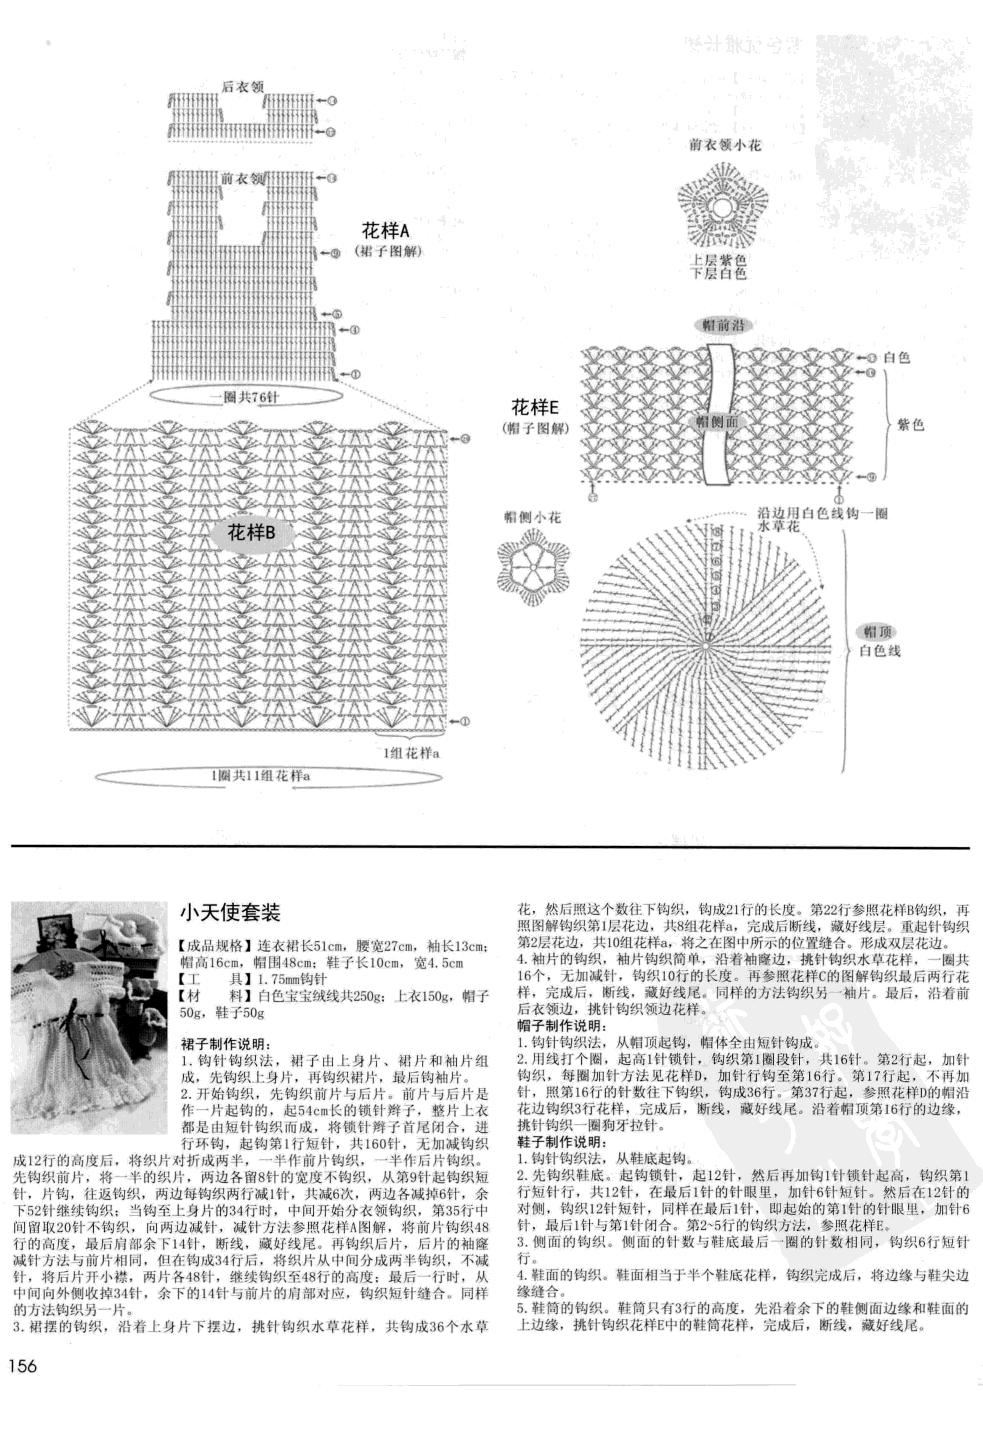 p (156).jpg